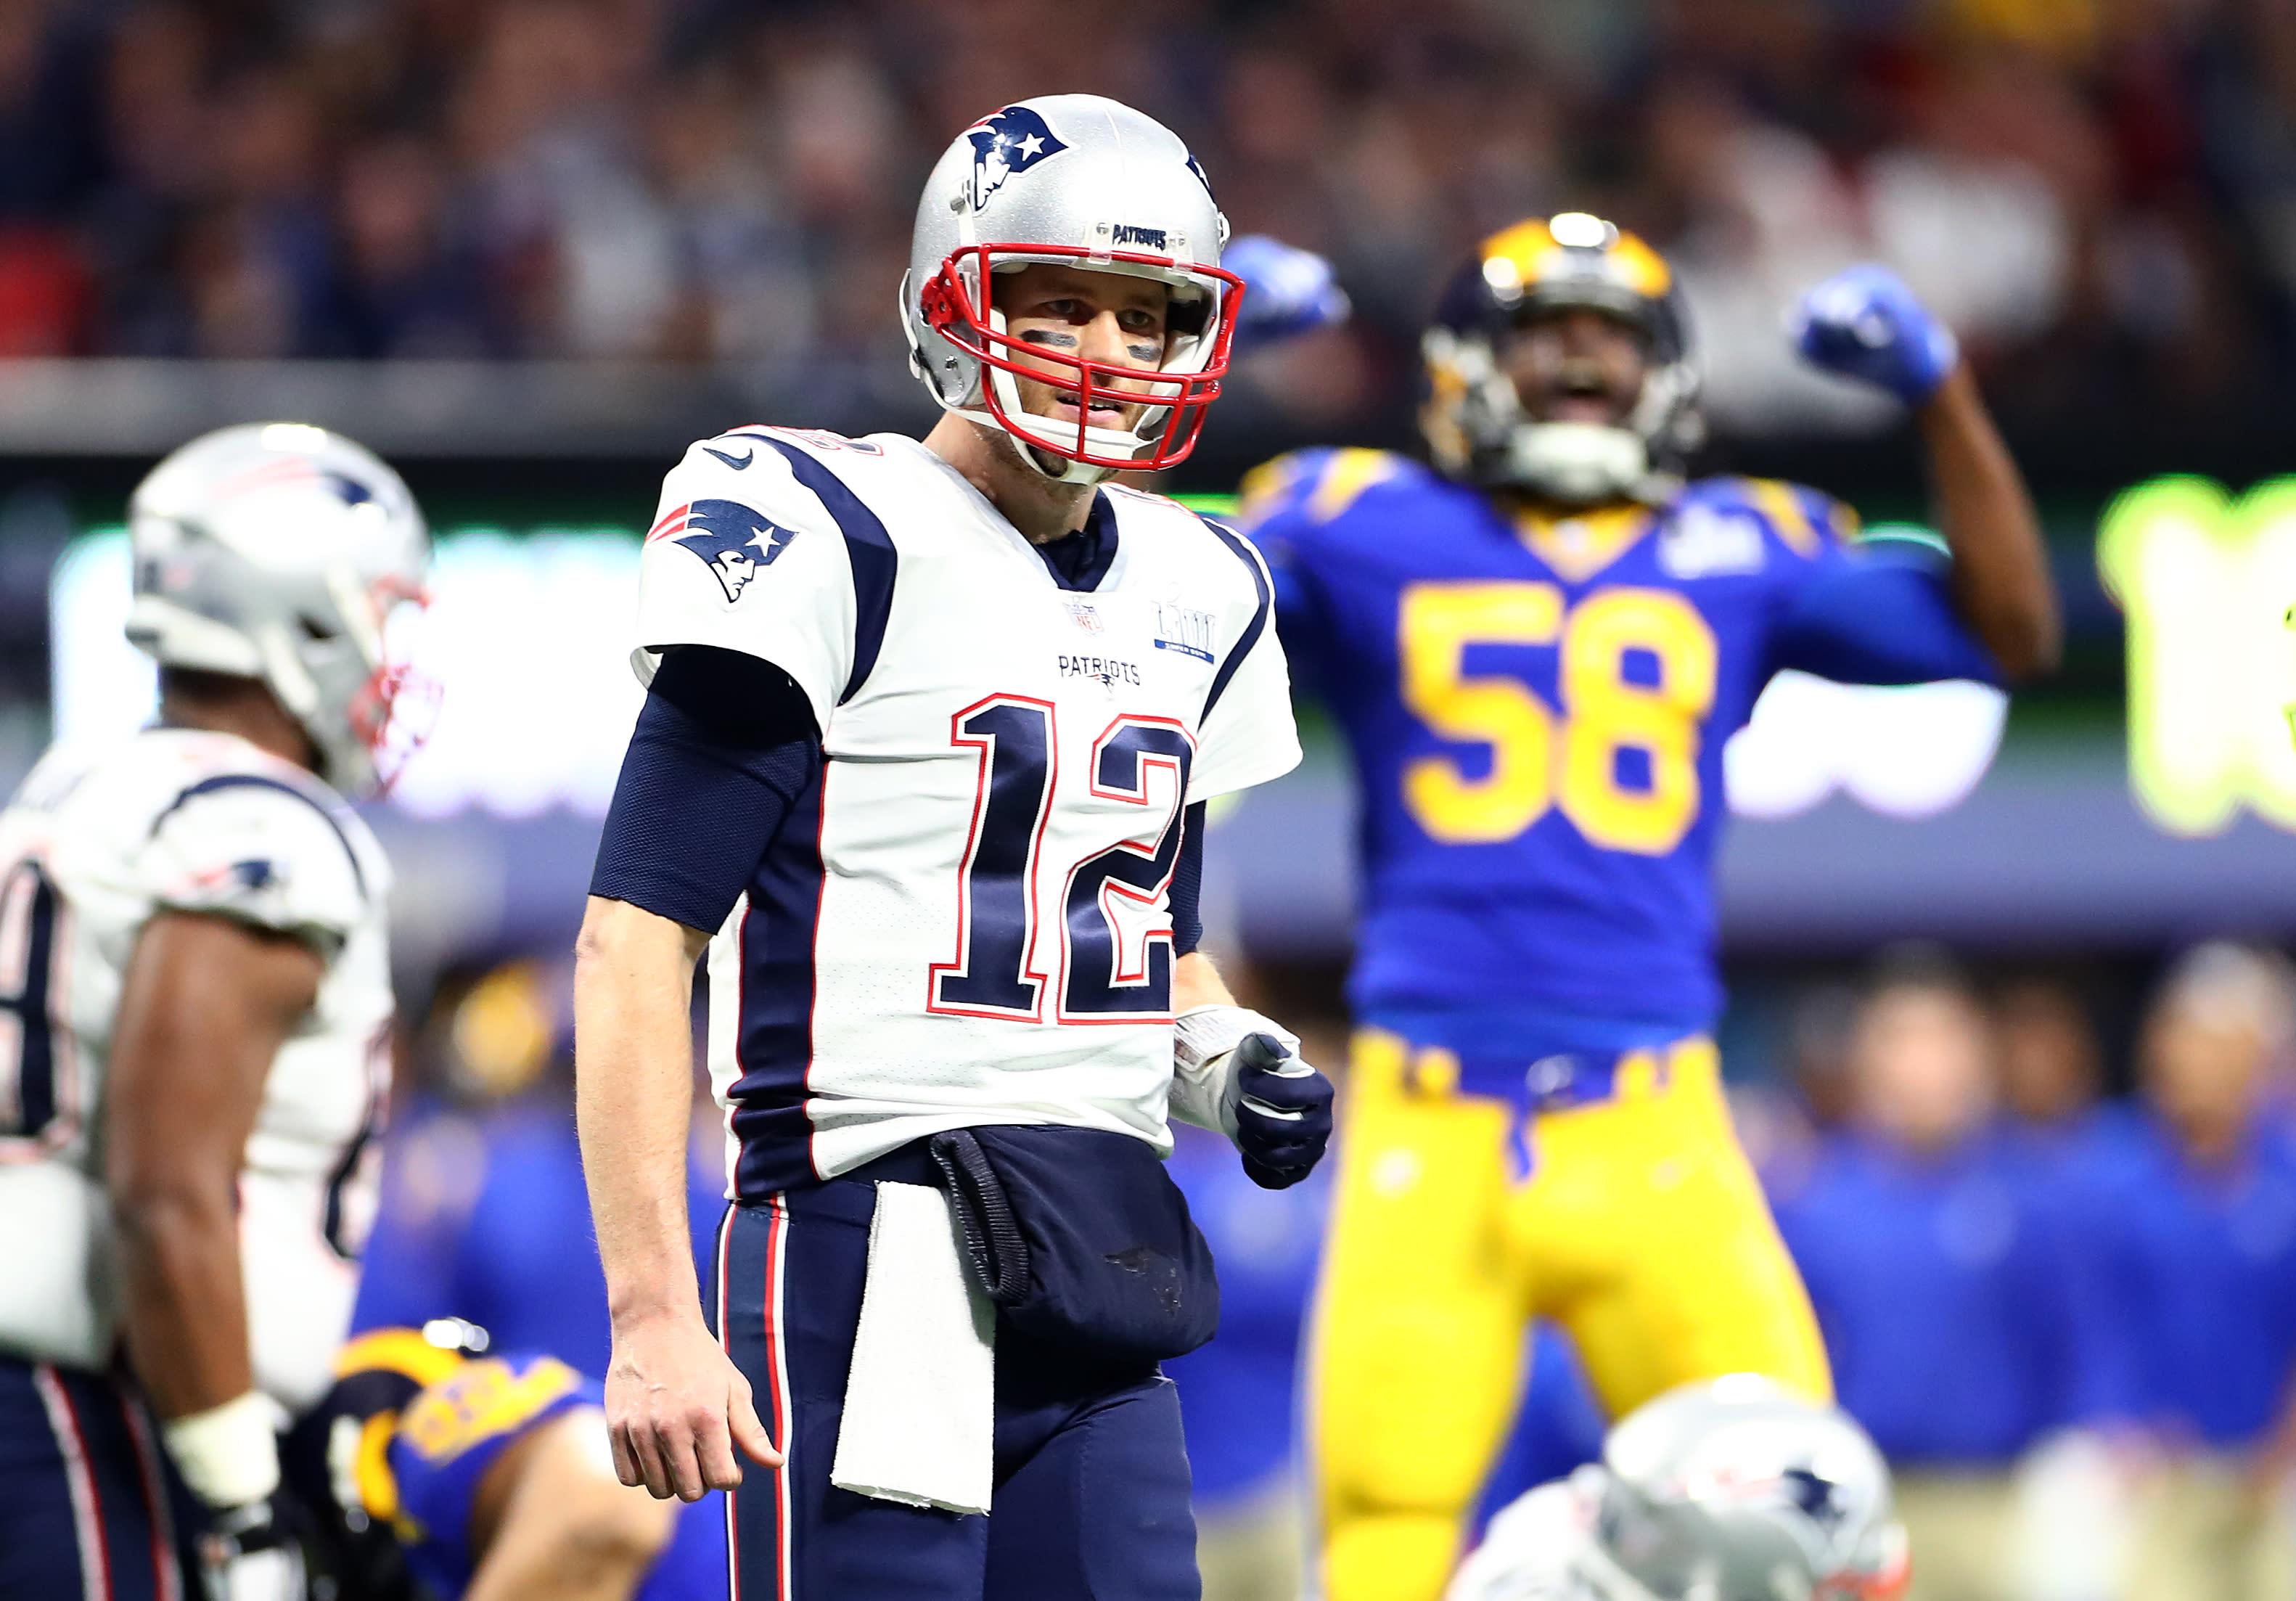 Tom Brady's Super Bowl starts with a pick